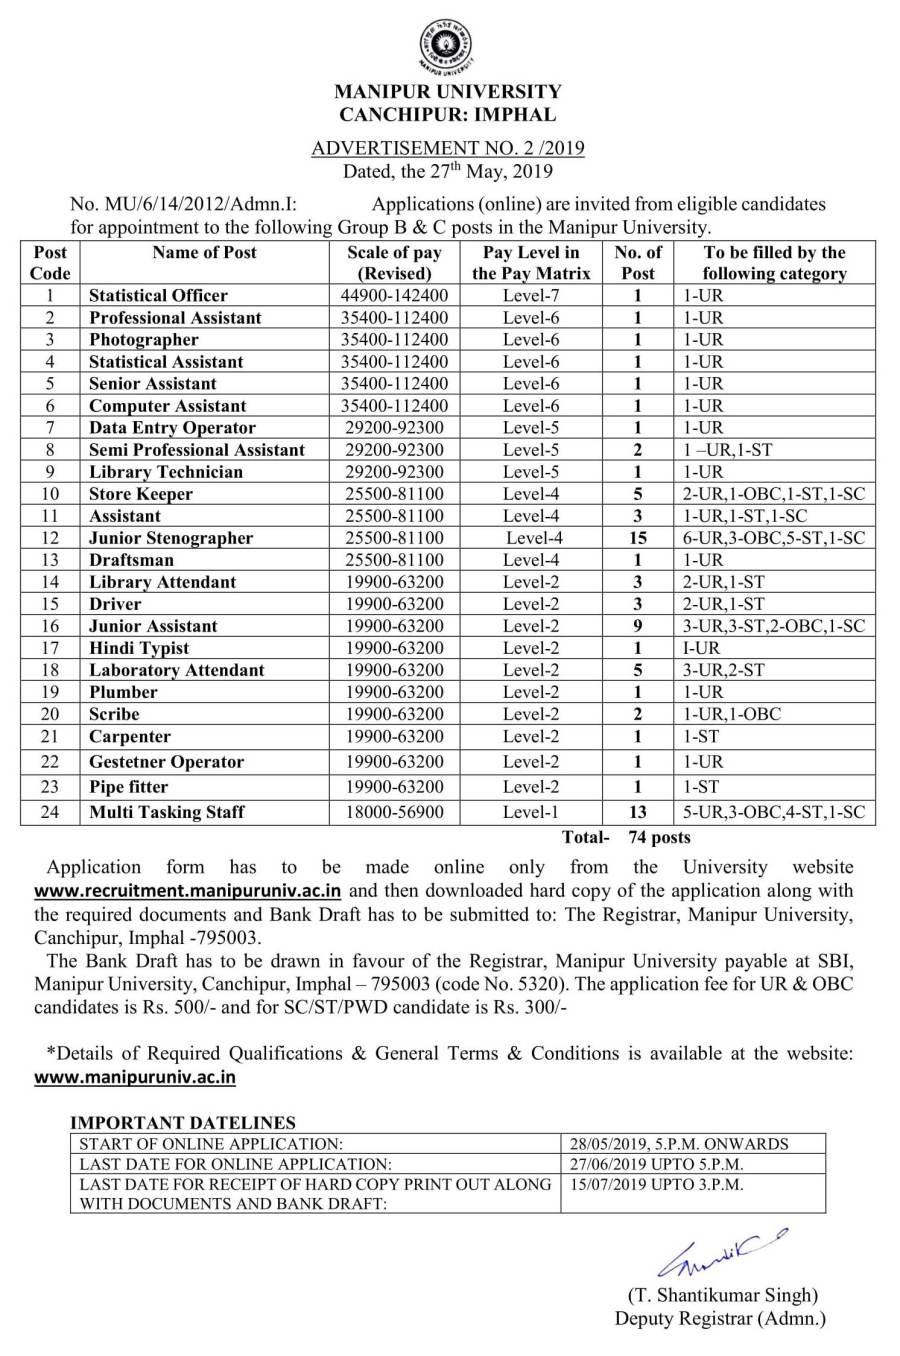 RecruitmentGBnC22019-1.jpg